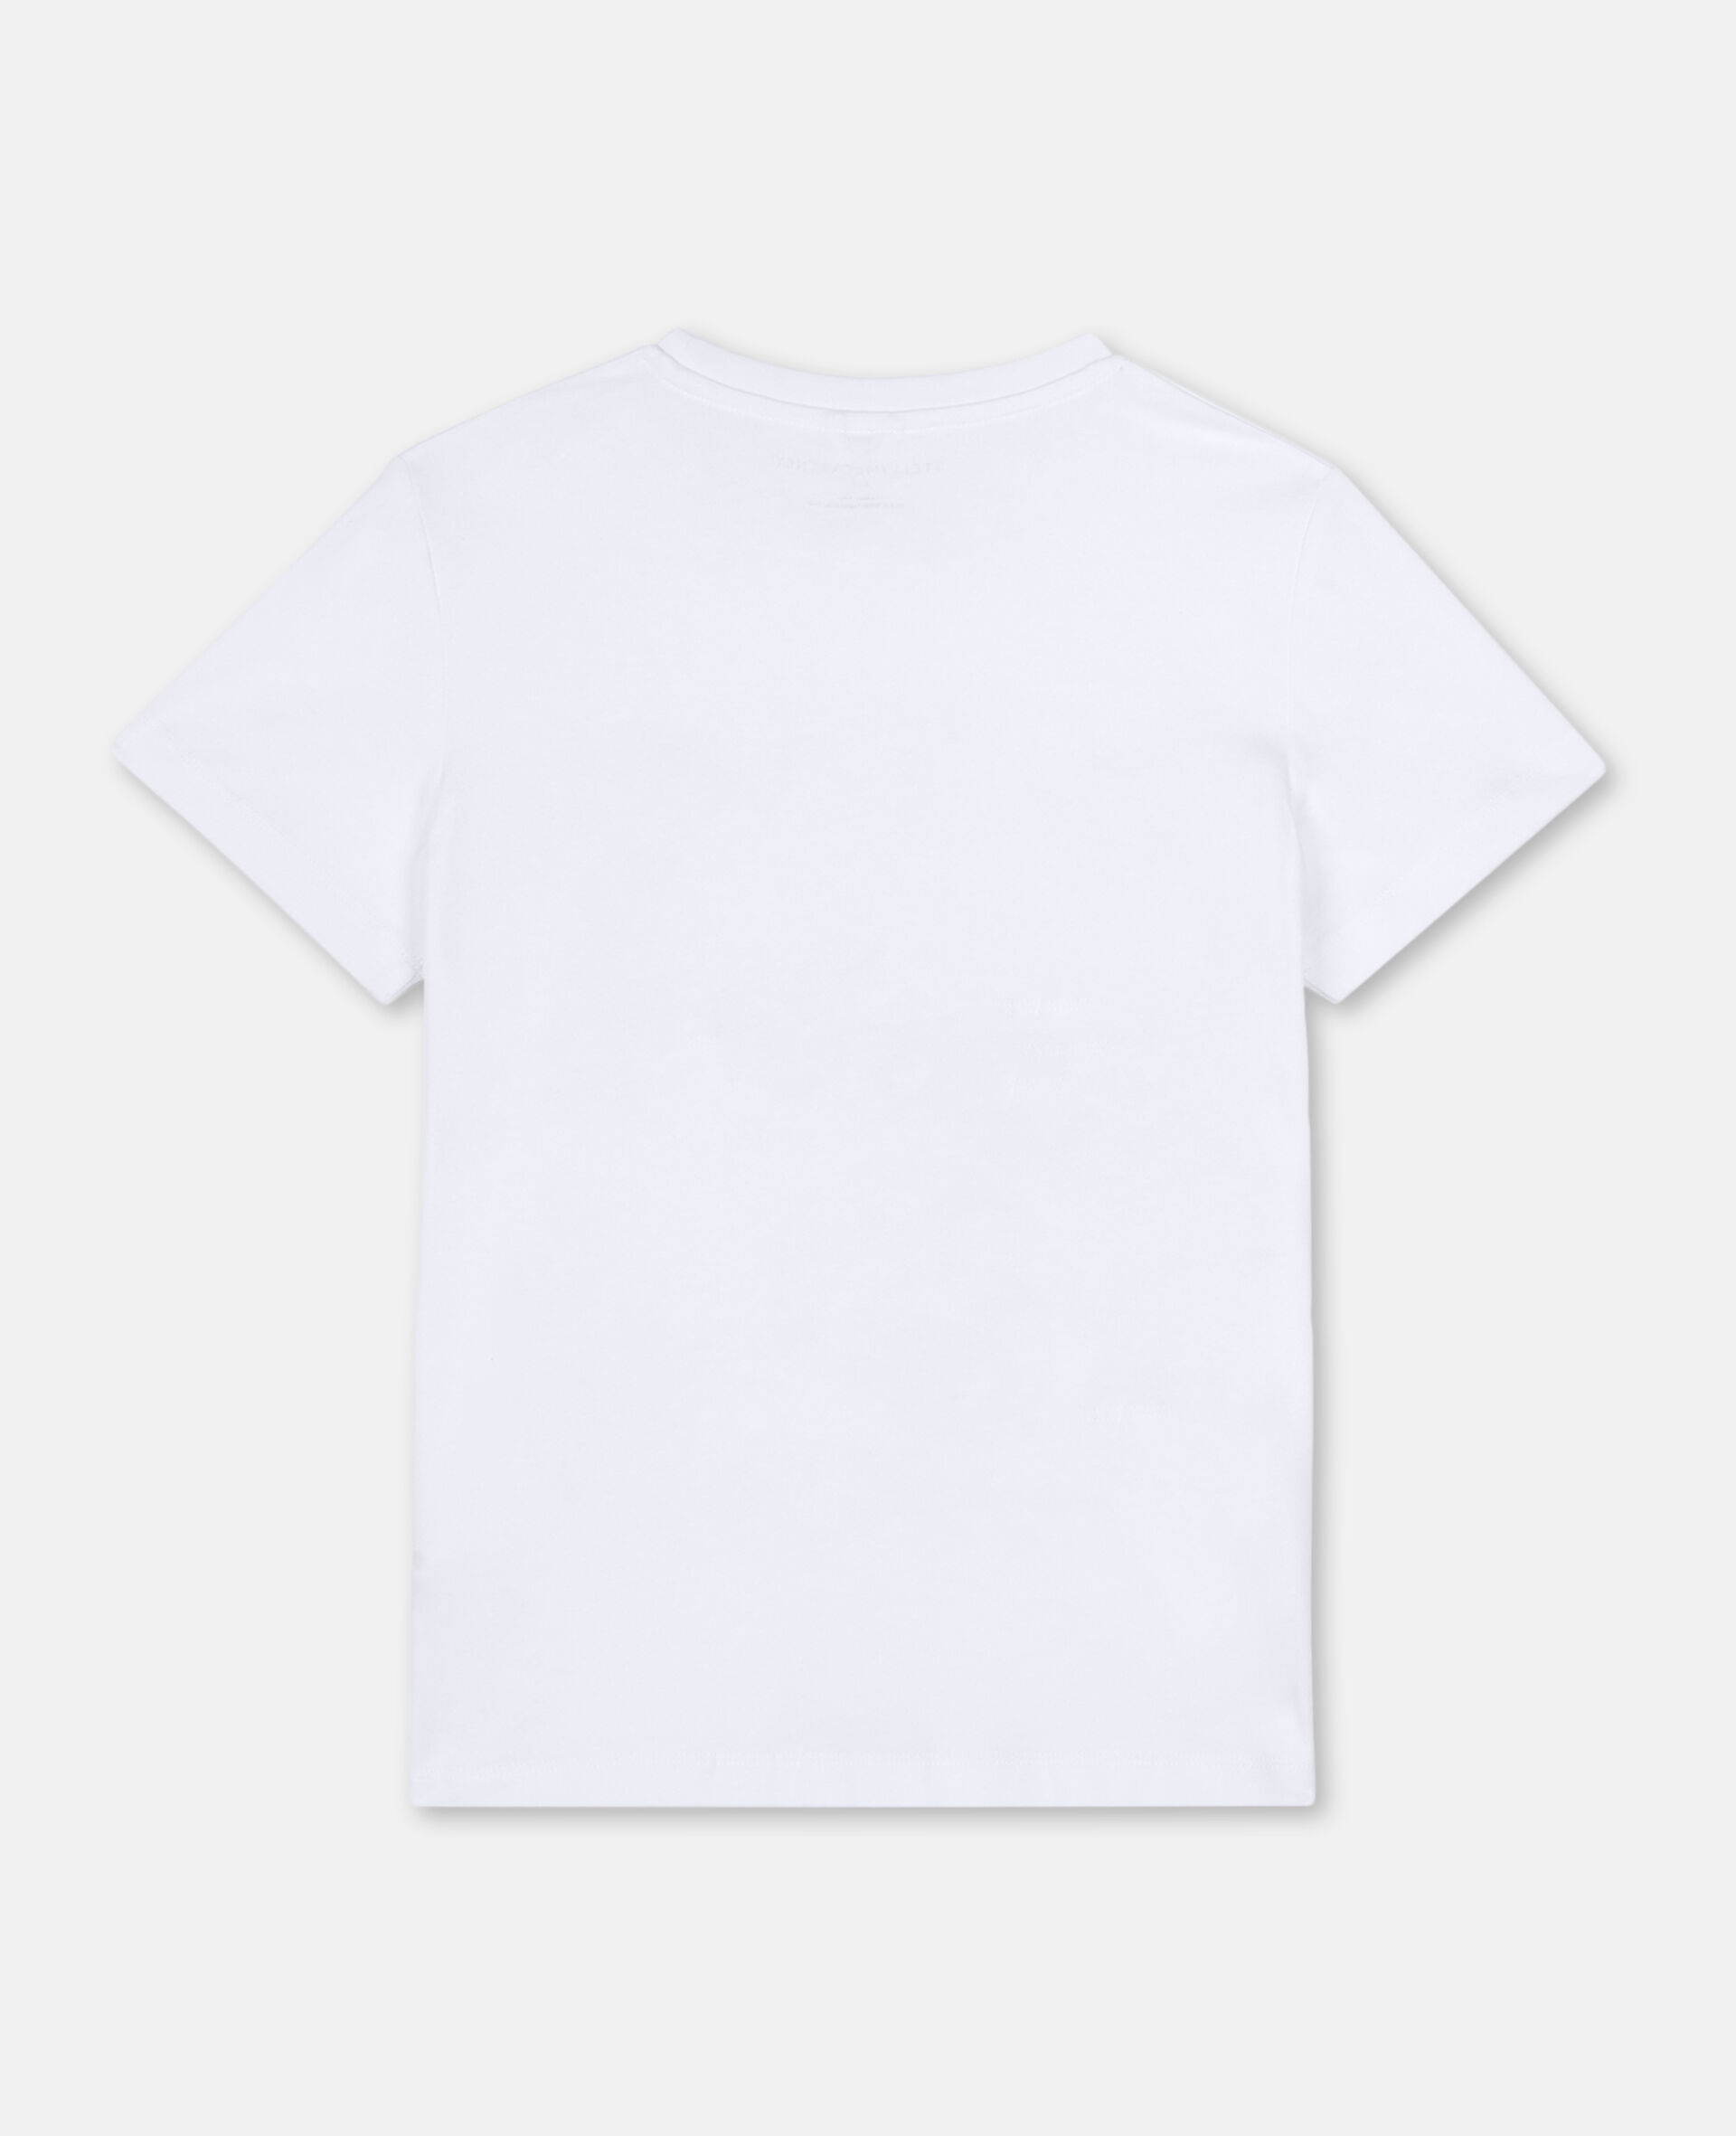 Baumwoll-T-Shirt mit Flamingos-Weiß-large image number 3